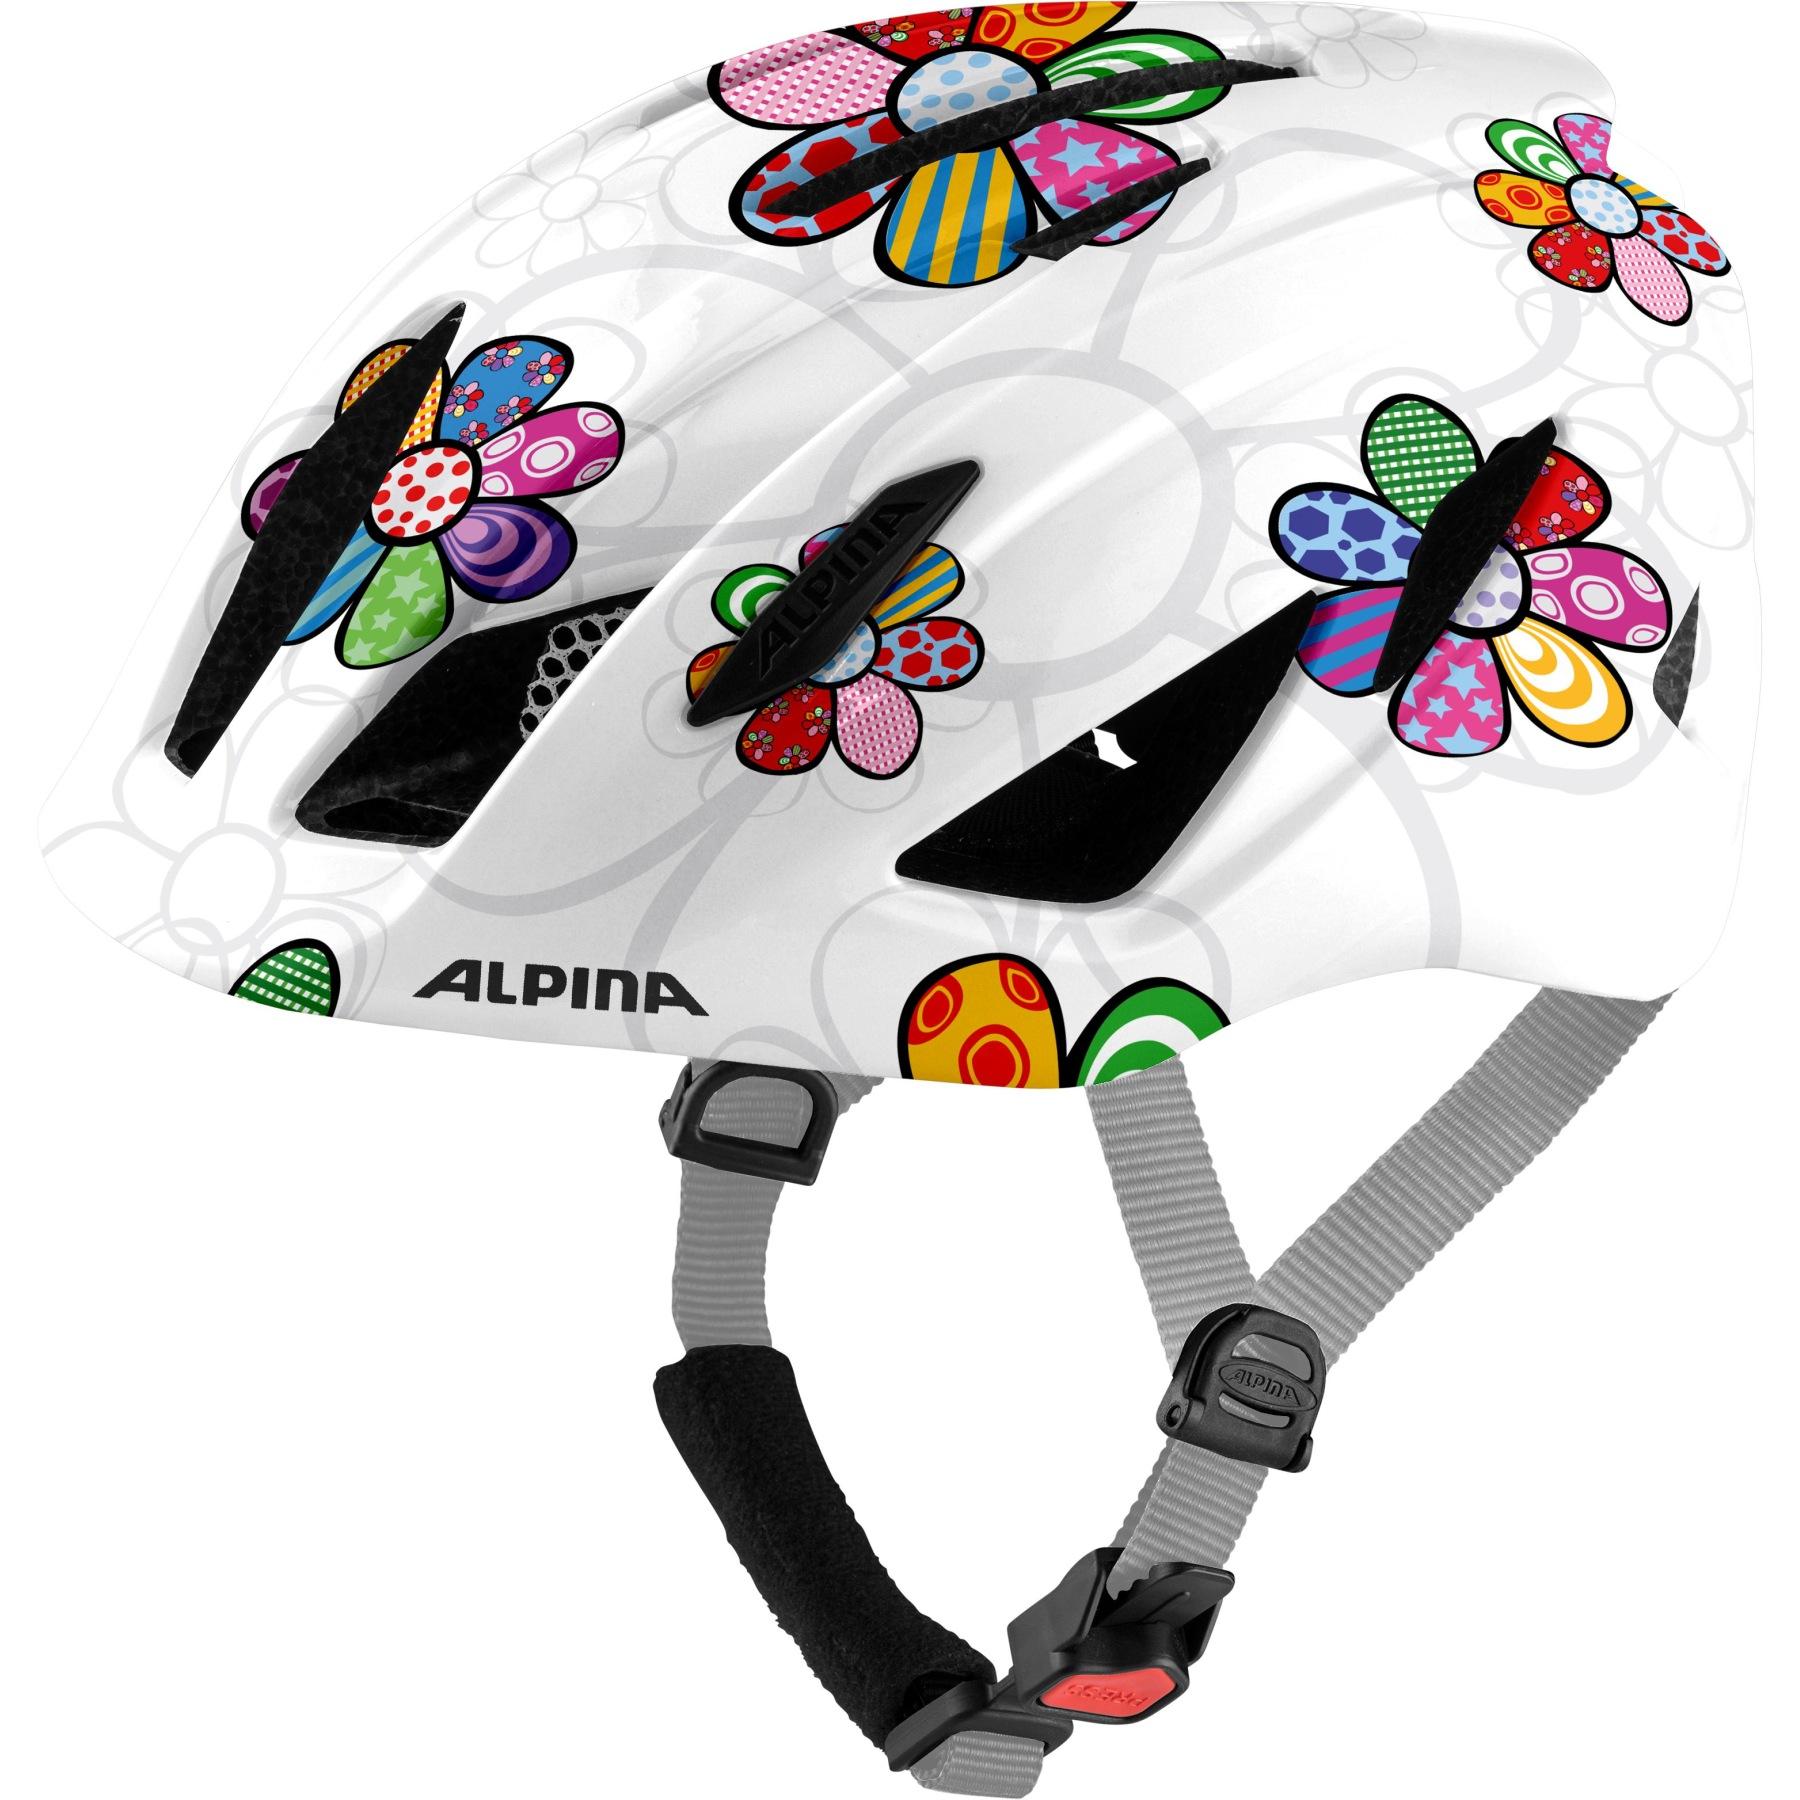 Alpina Pico Kids Helmet - pearlwhite-flower gloss